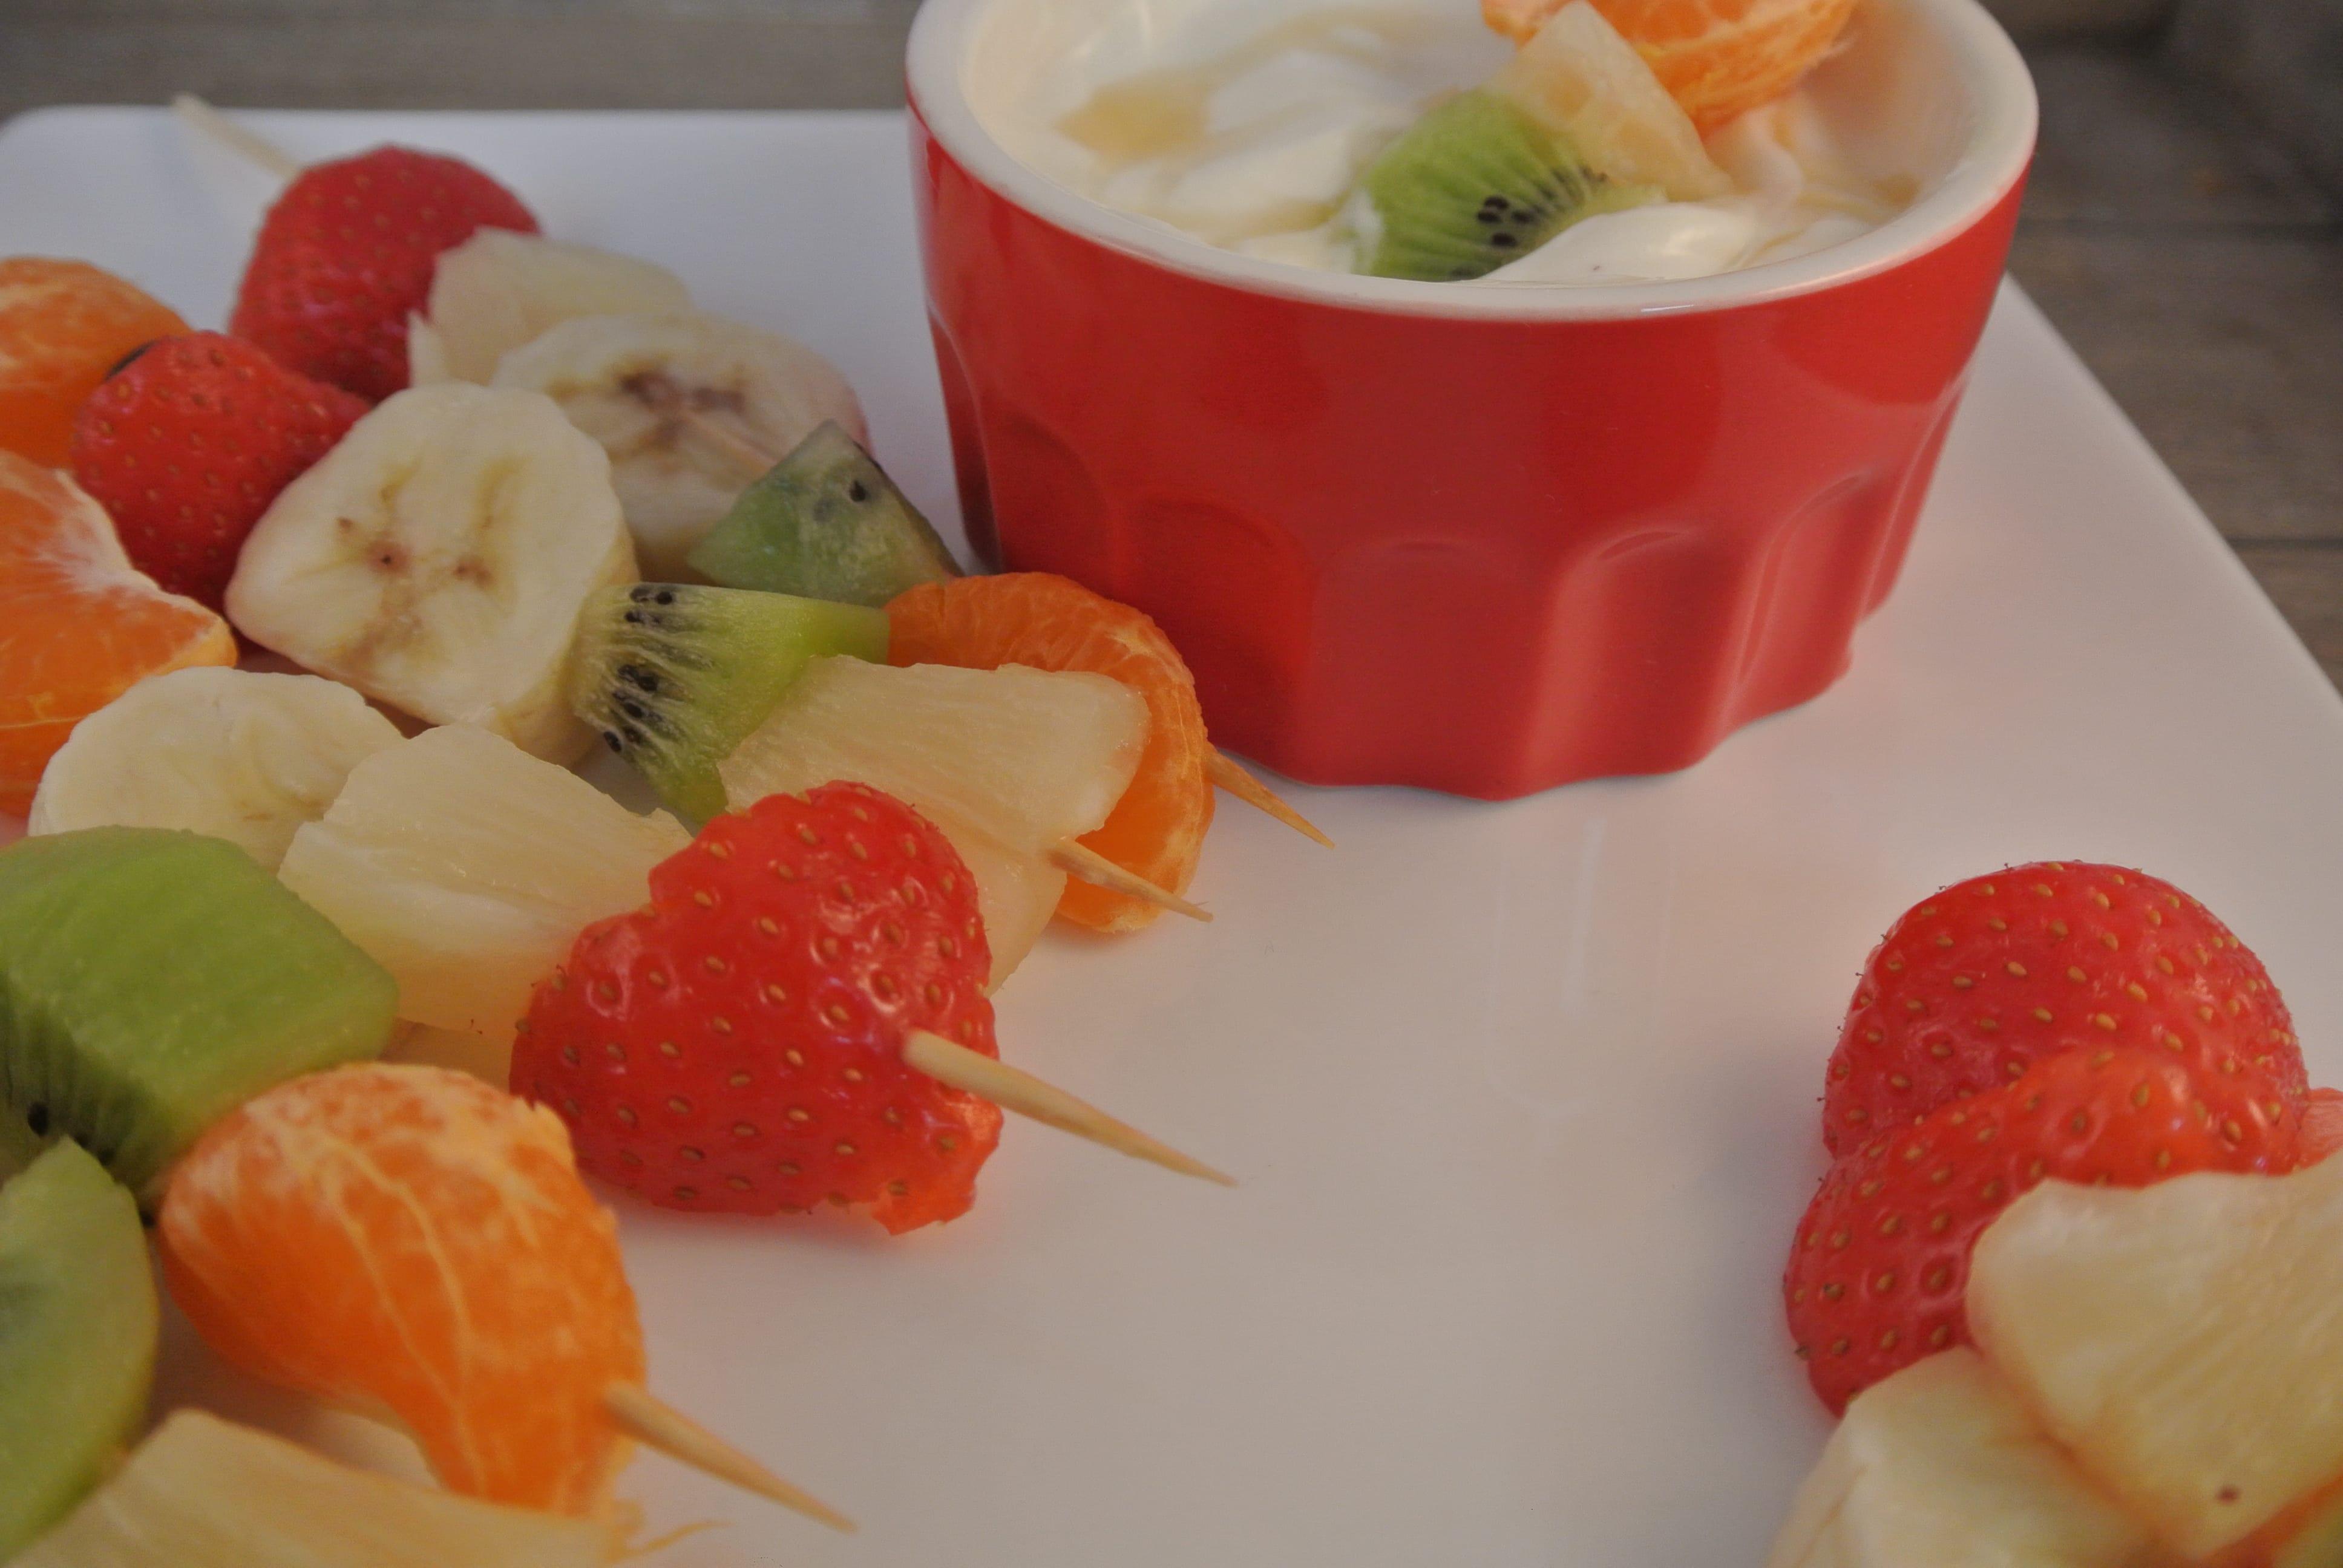 Fruitsalade met Griekse dip